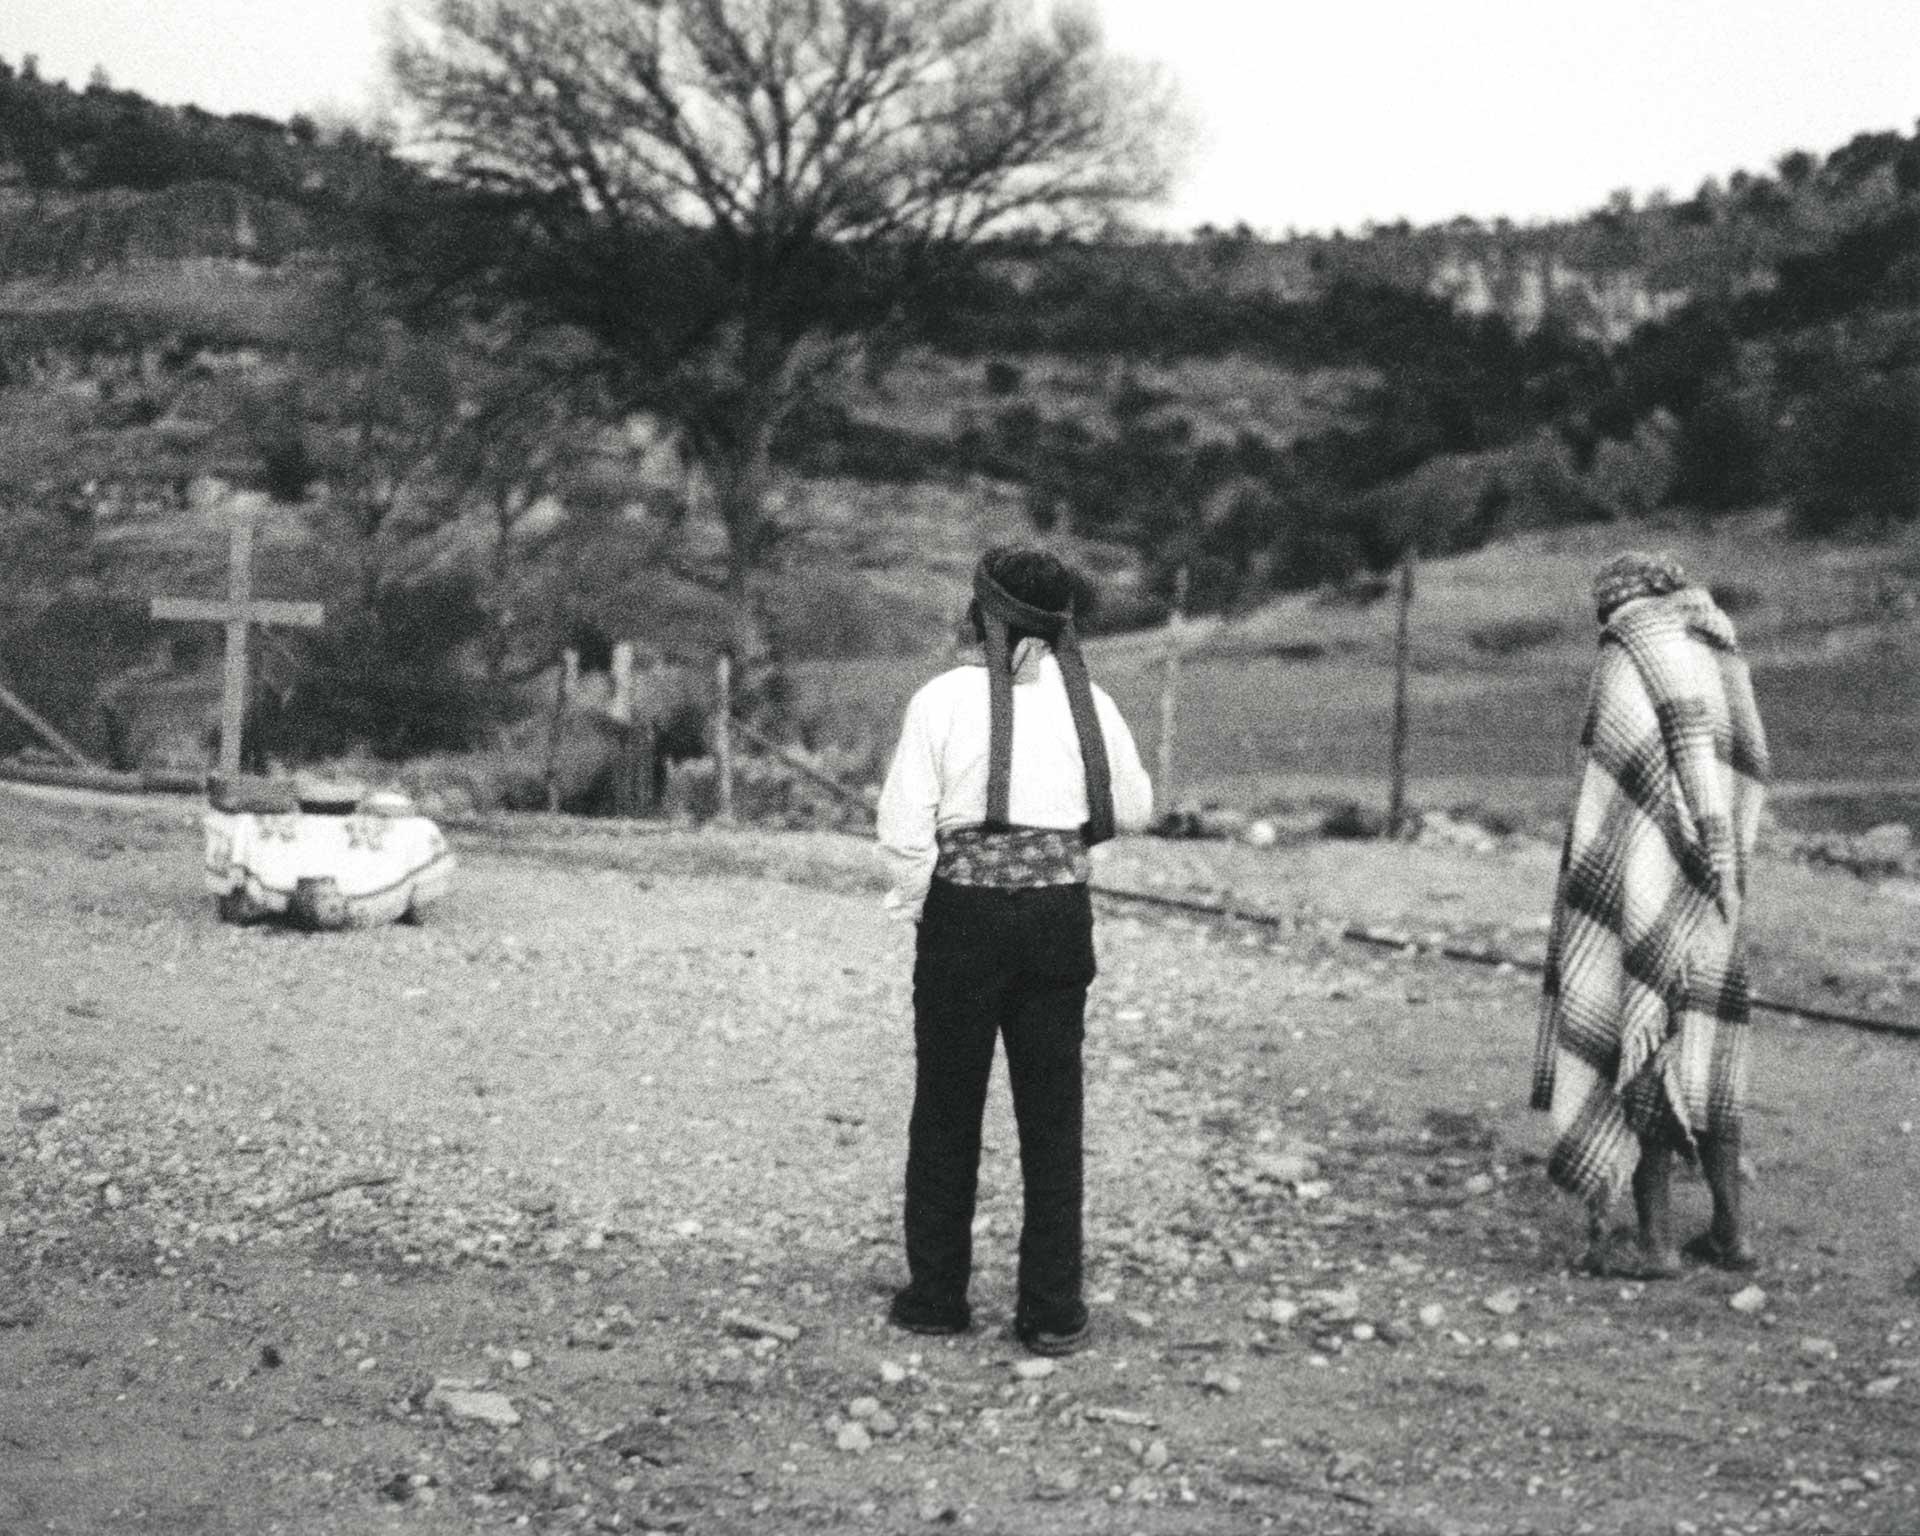 KWIRA (Tarahumara) #150 ©Oskar Landi . Black & white - two men walking in cemetary